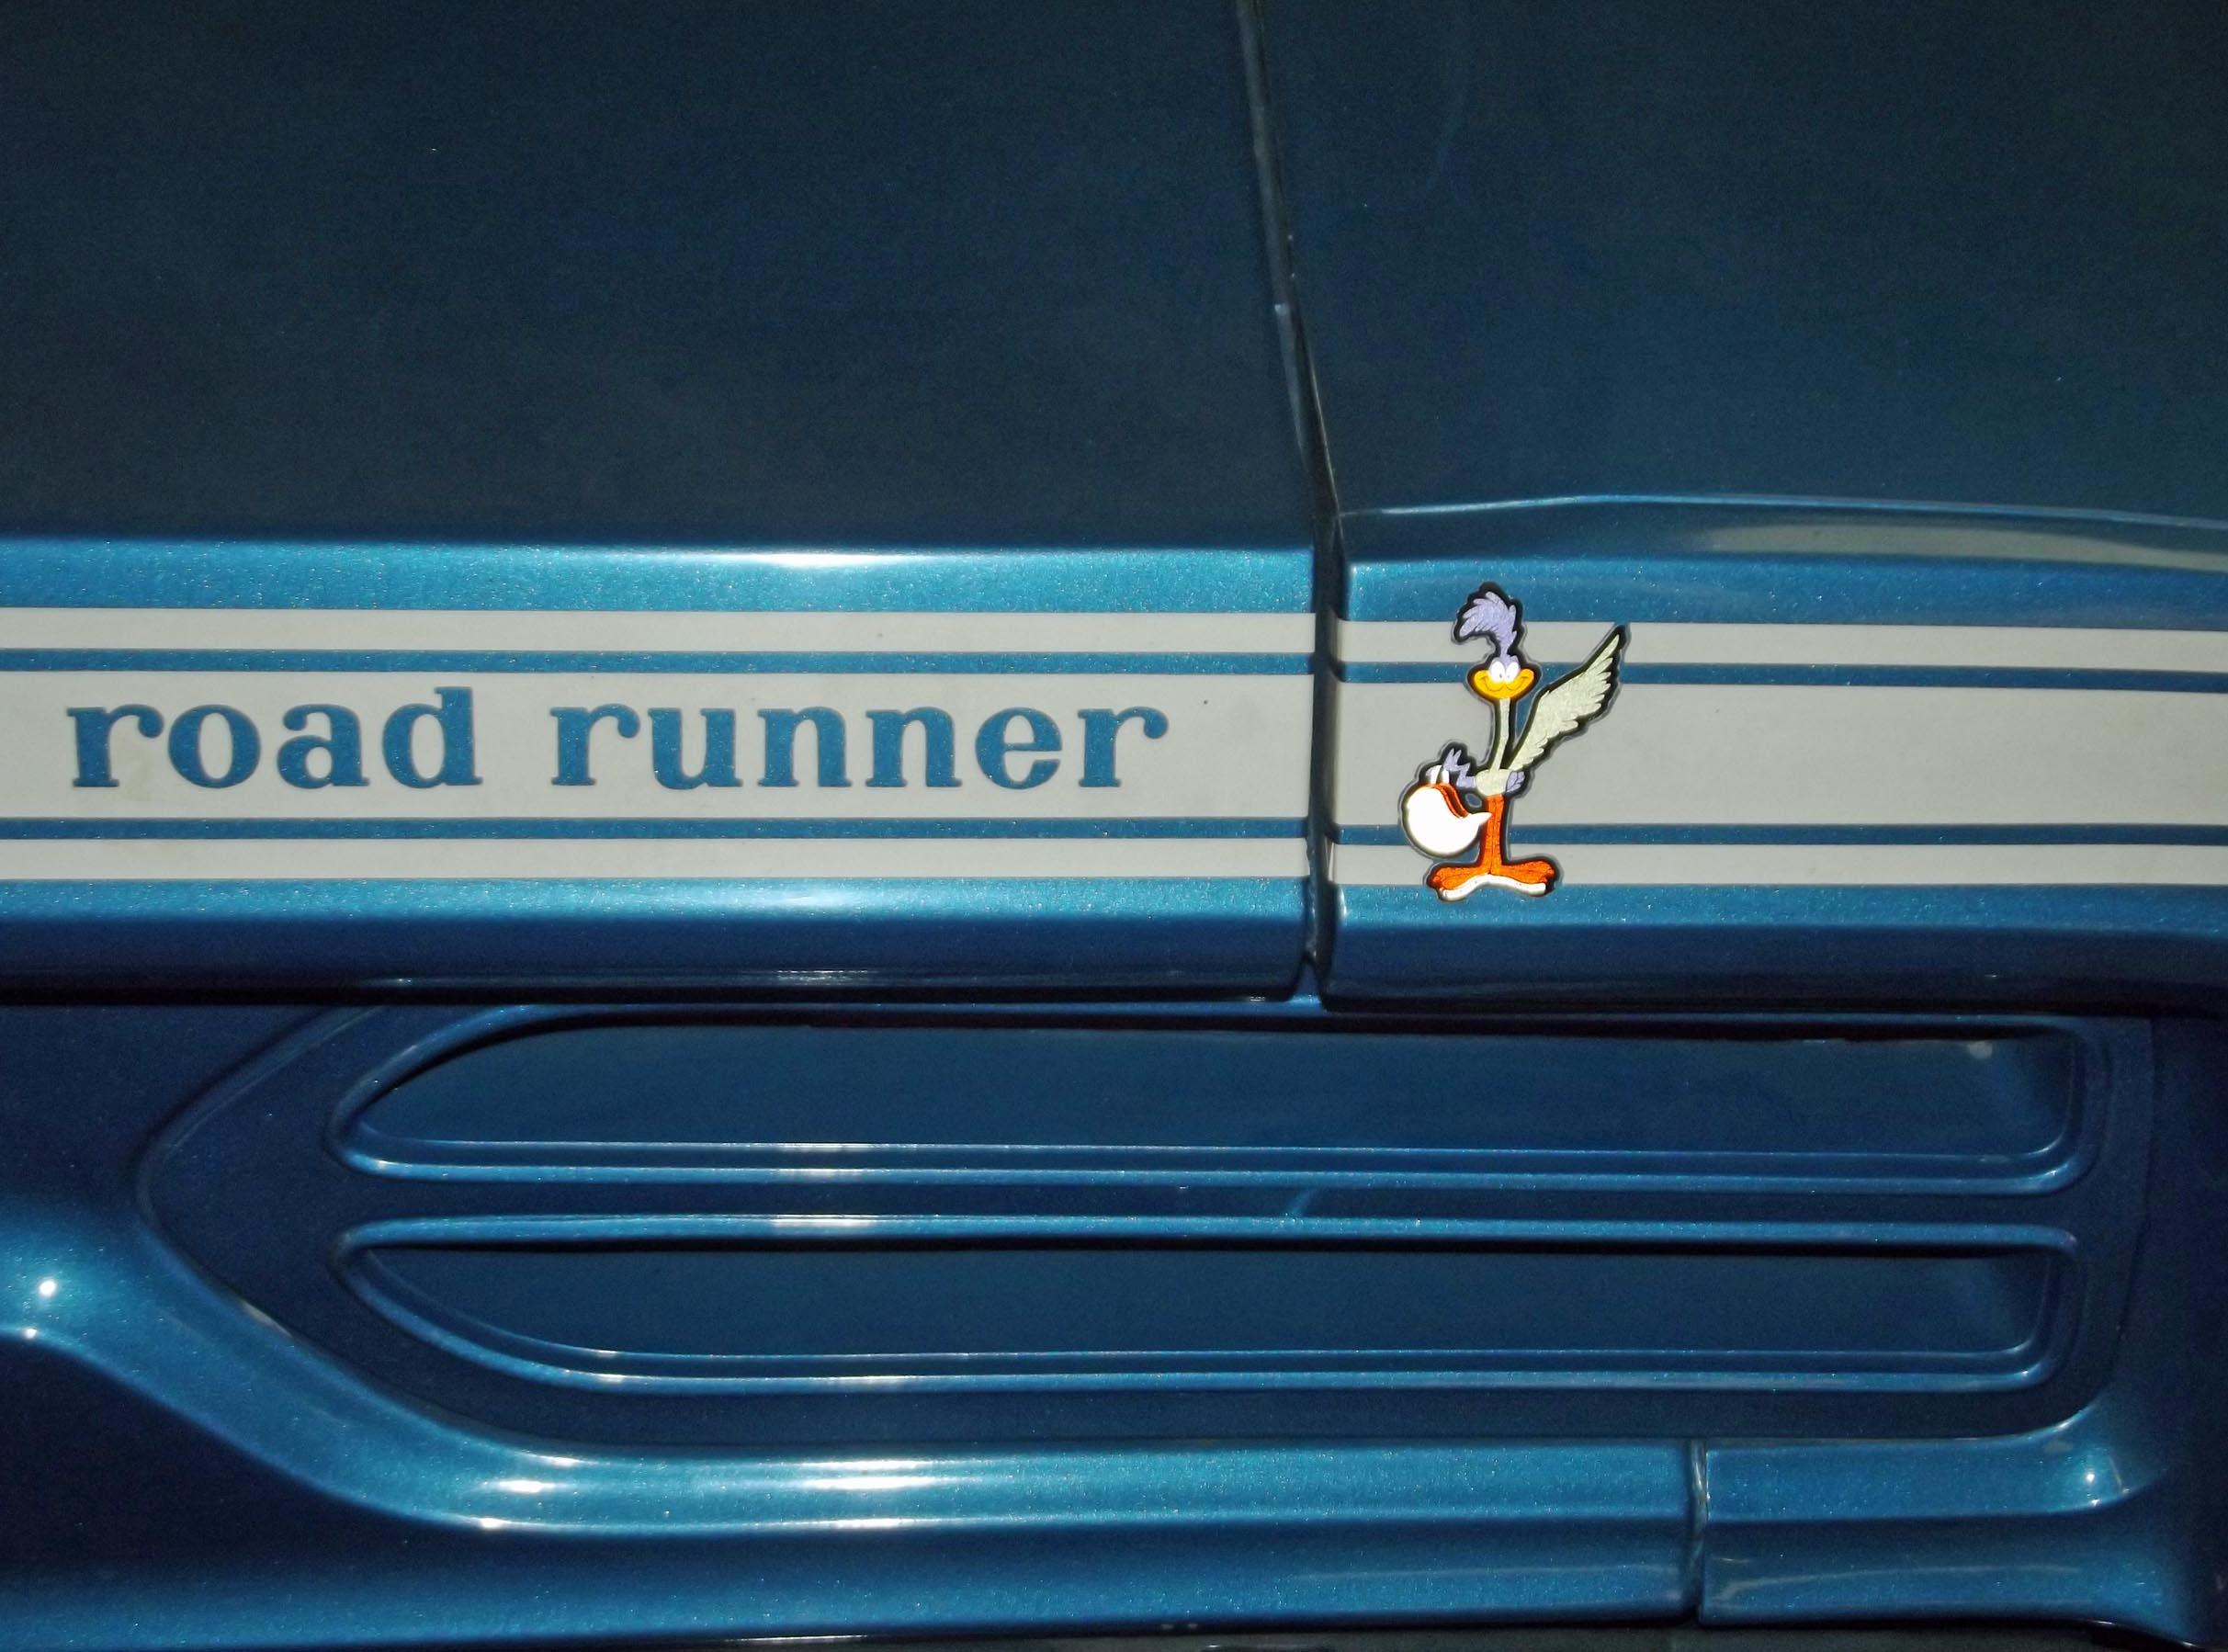 Blue car with roadrunner cartoon image